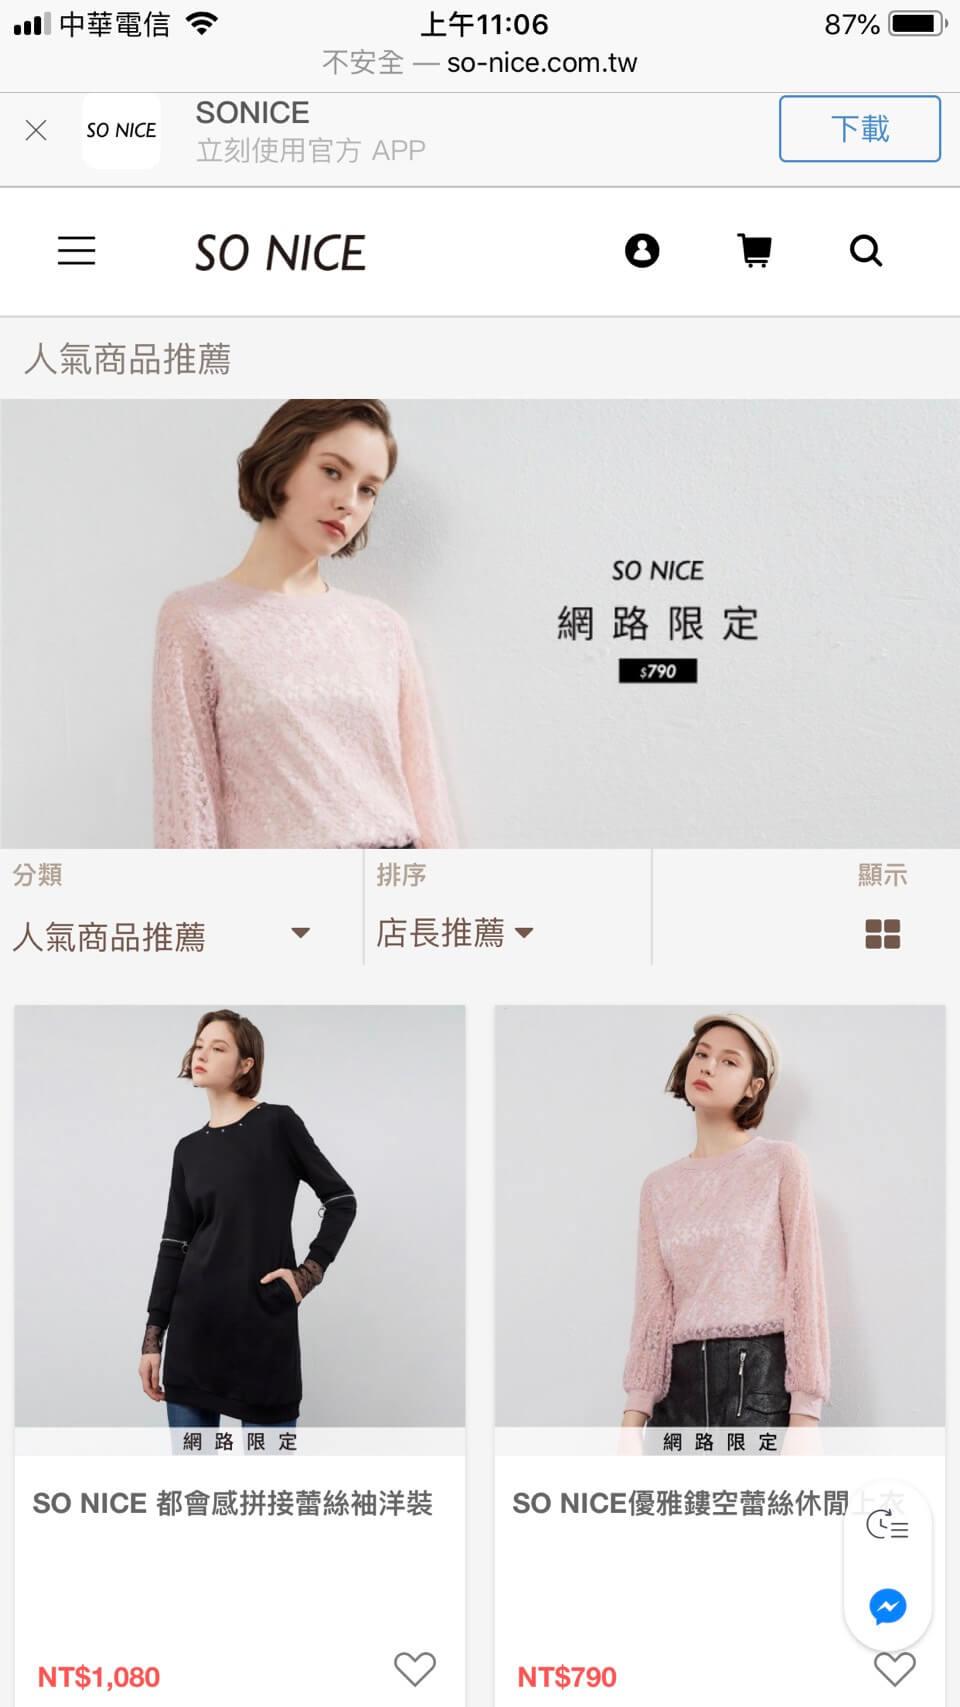 91APP人氣店家 So Nice 線上商店 商品分類頁